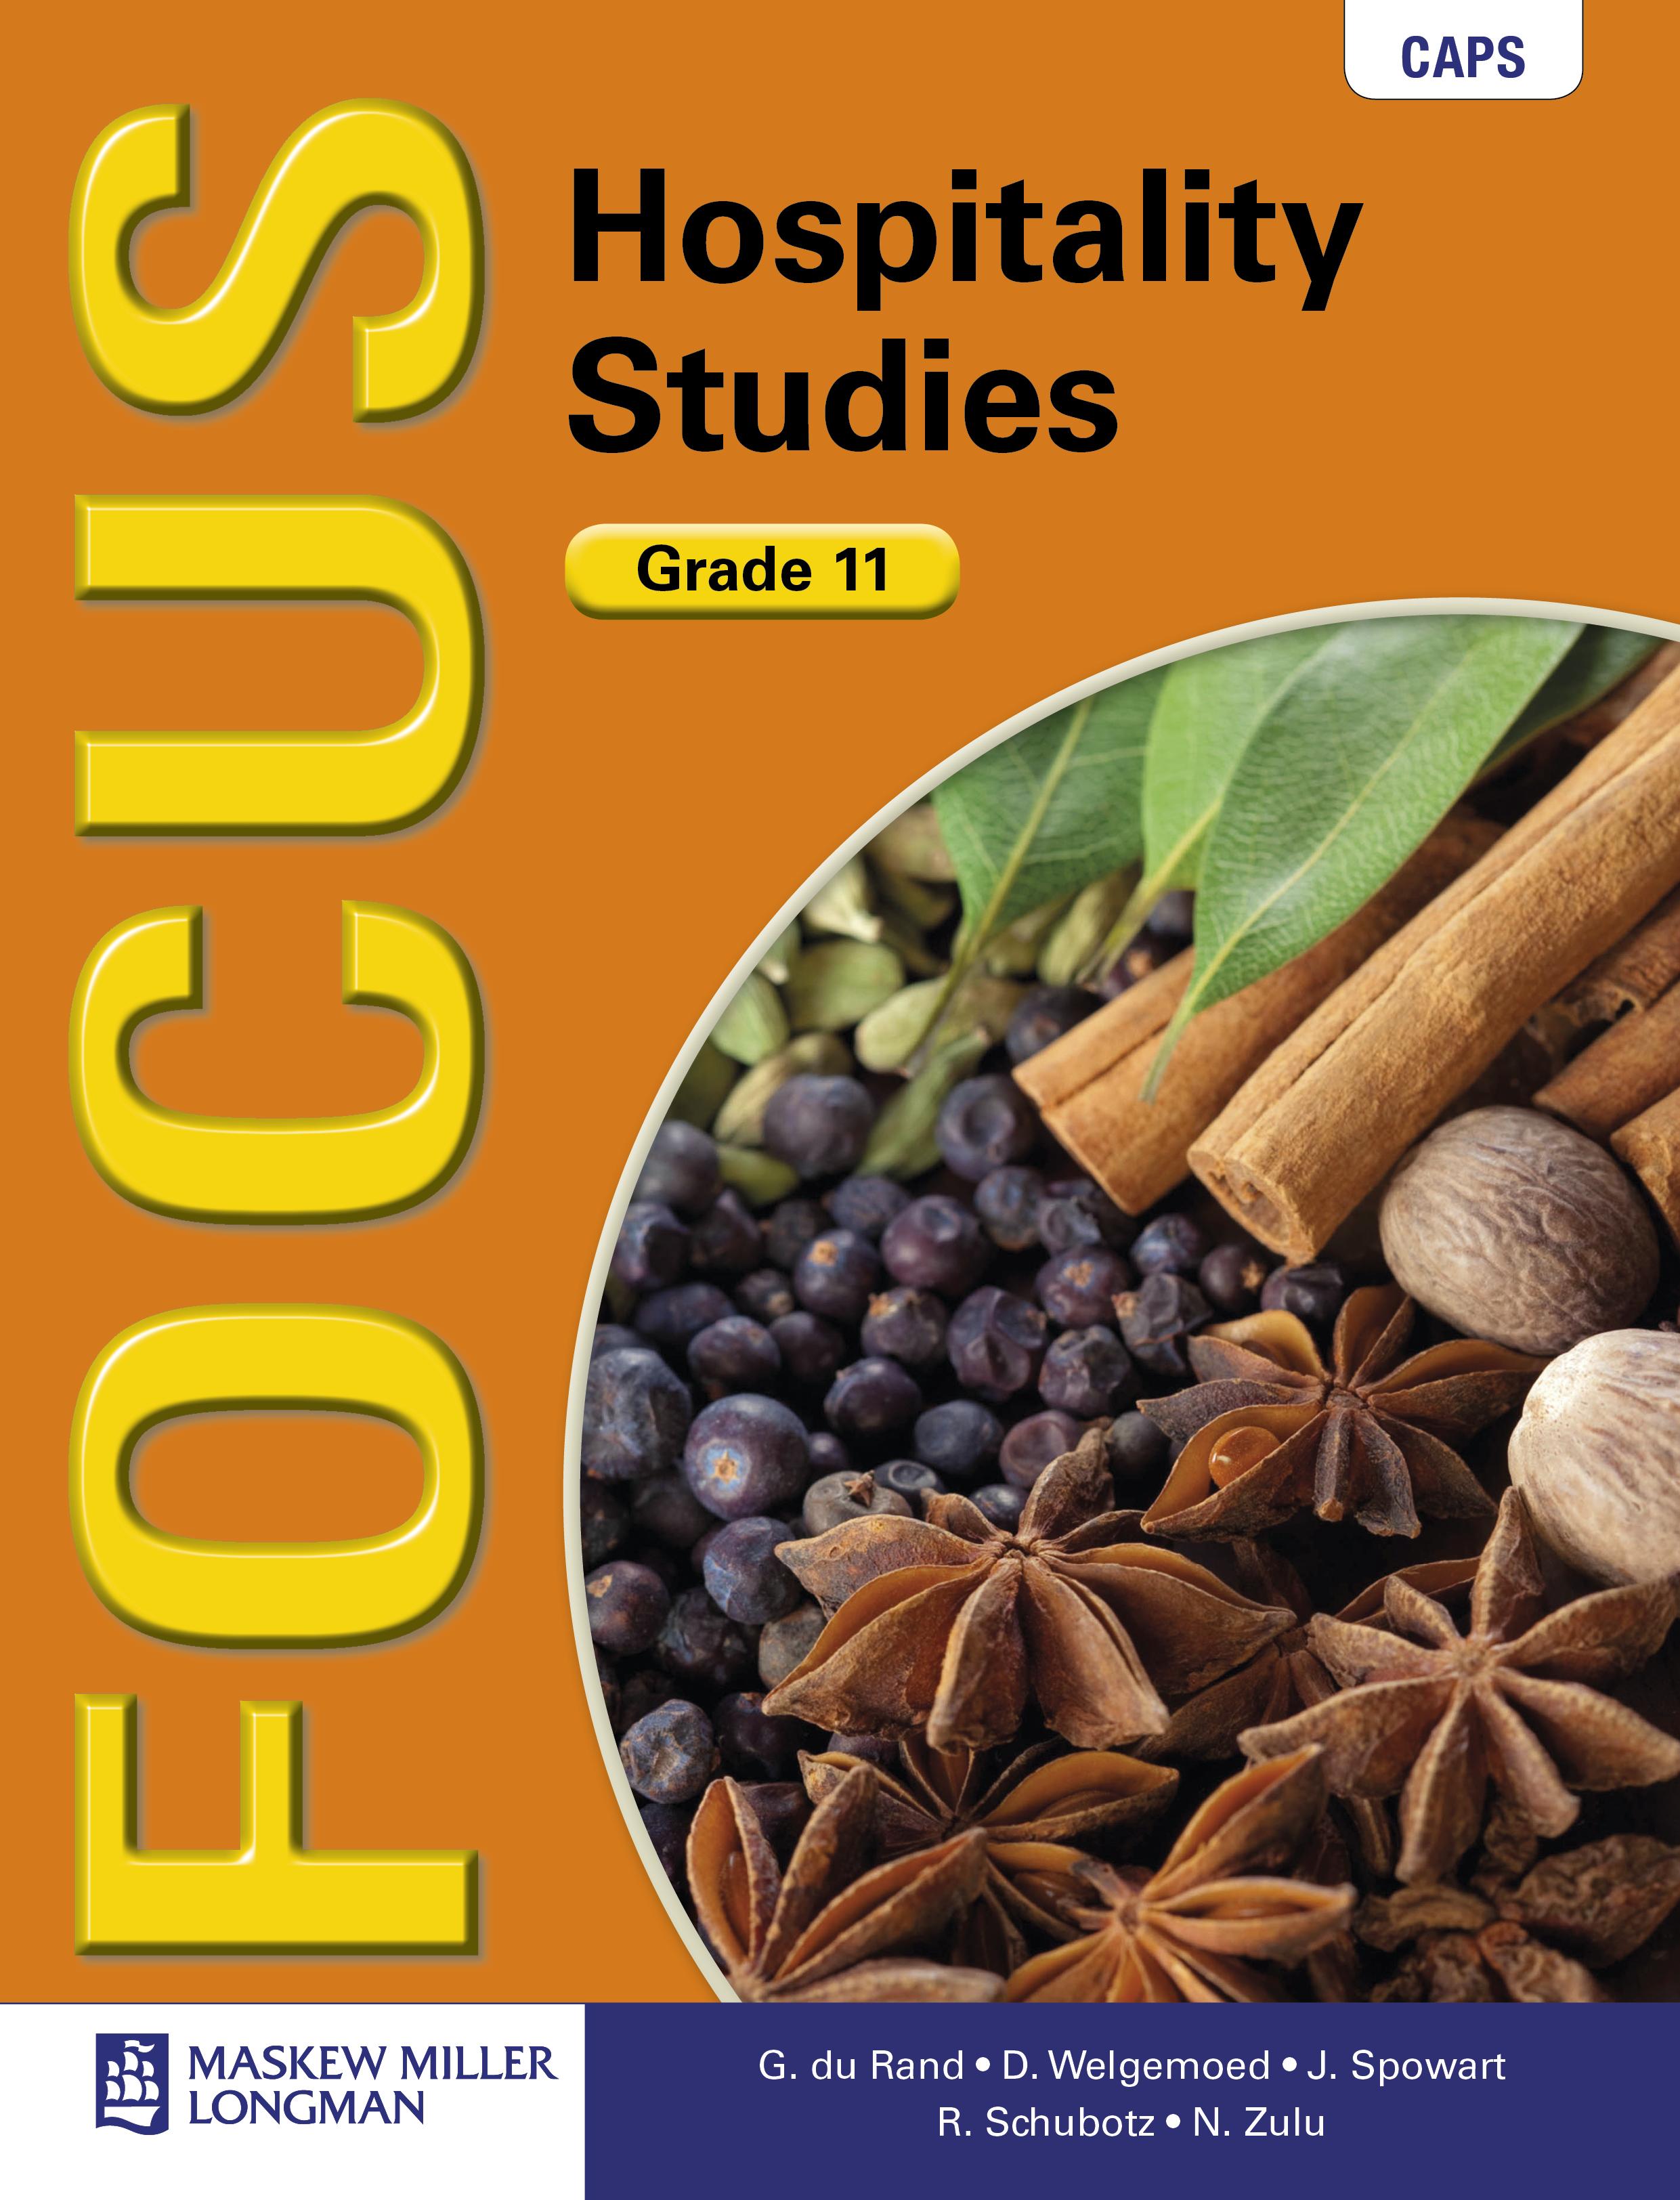 Picture of Focus hospitality studies CAPS